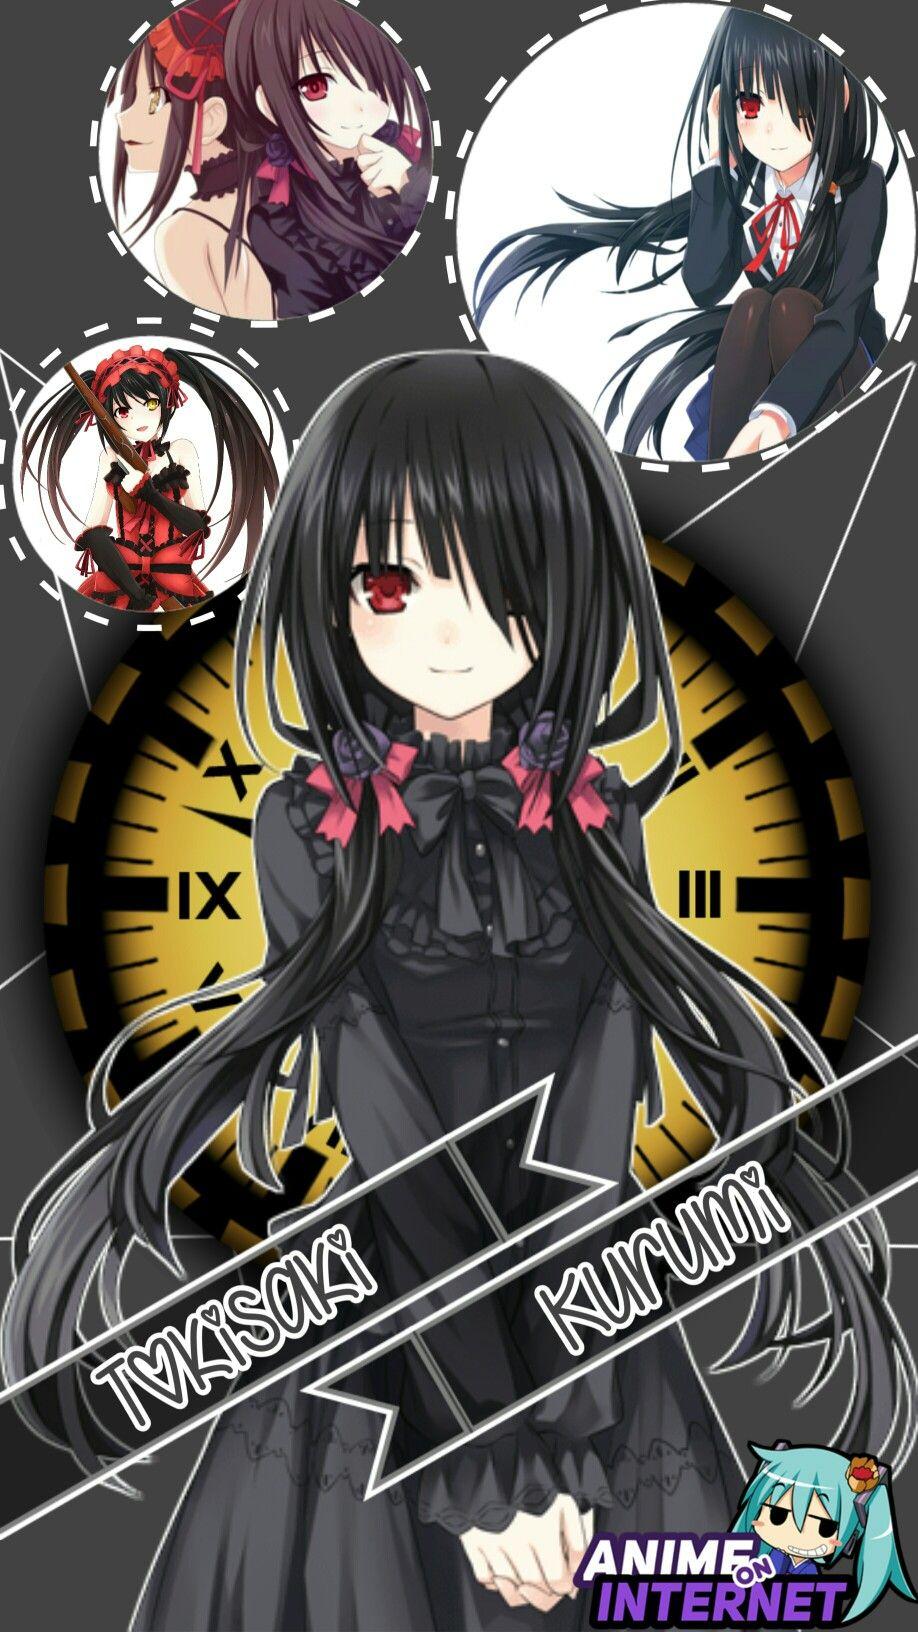 Wallpaper tokisaki kurumi Anime, Yandere anime, Anime